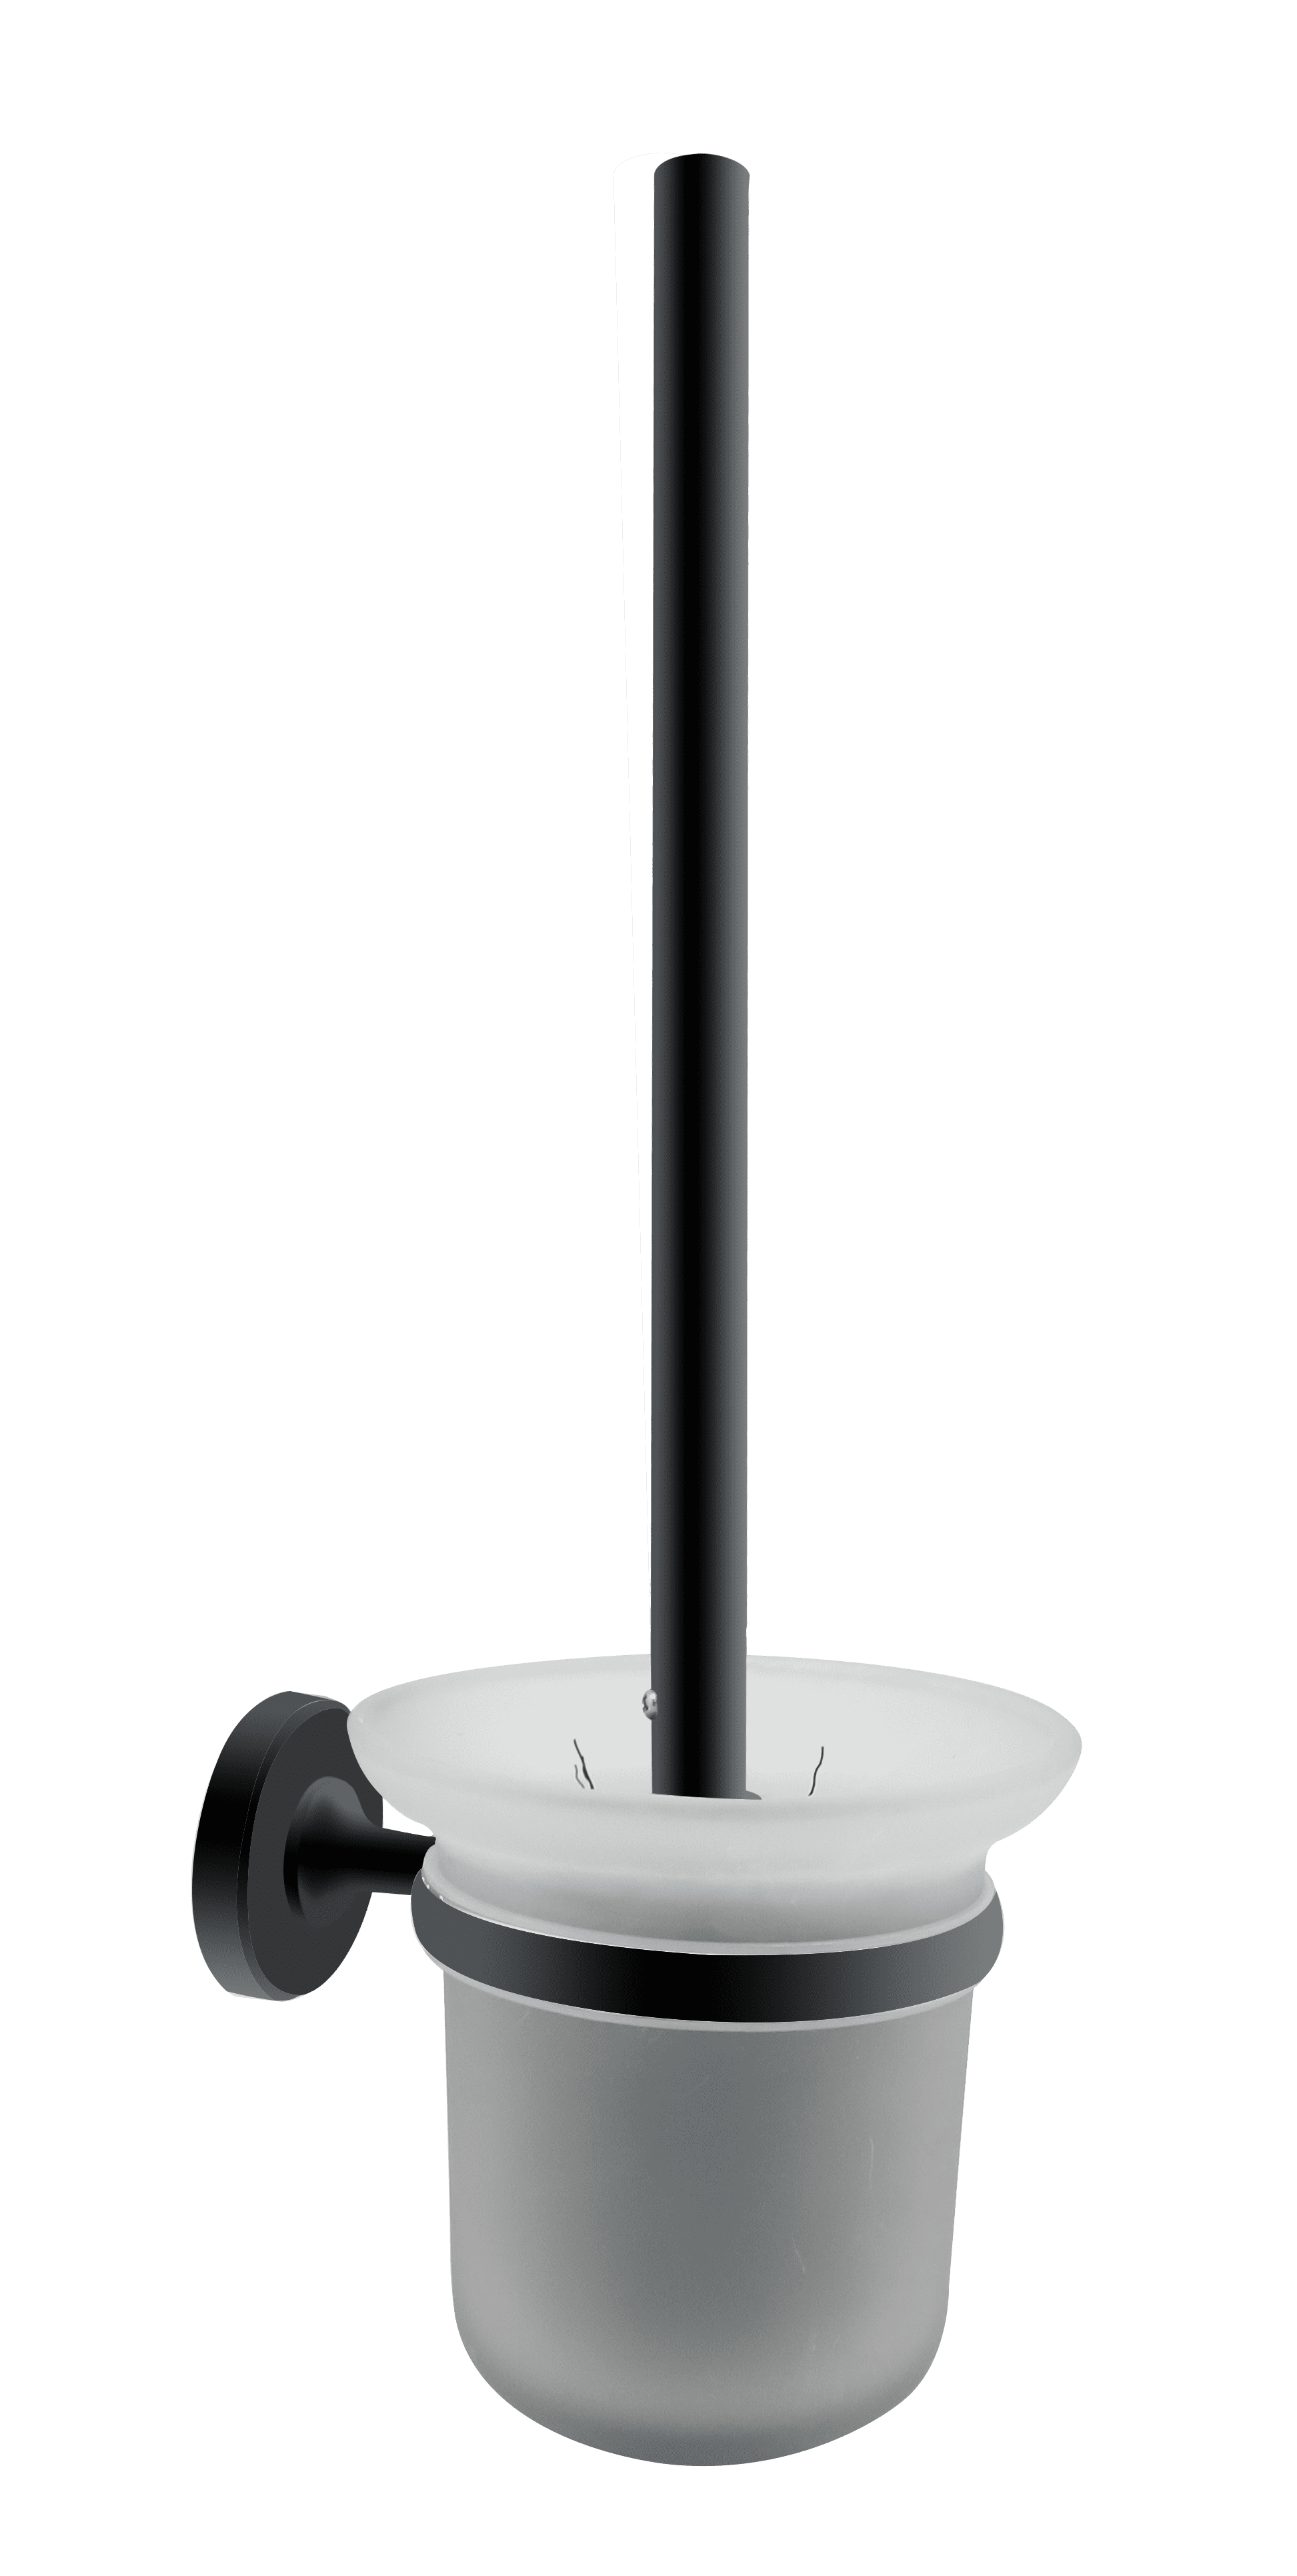 4bathroomz® Oslo Glazen Toiletborstel met wand houder - Zwart